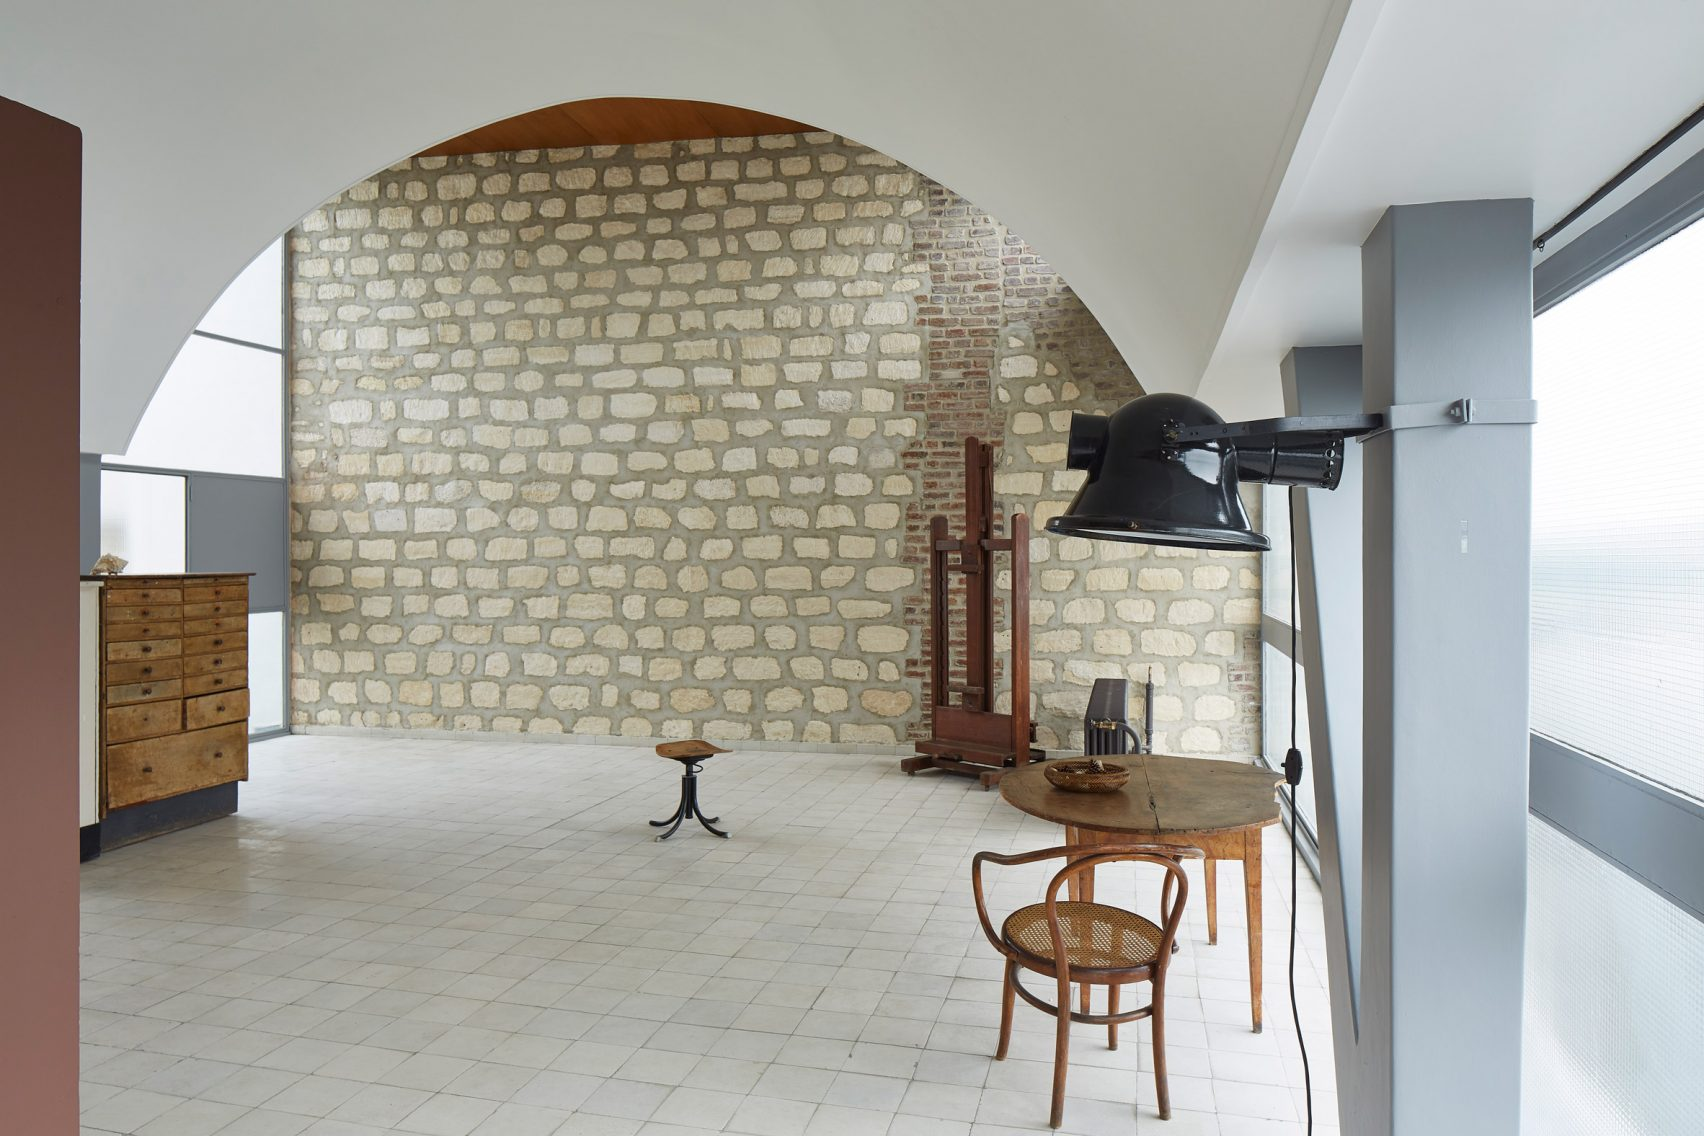 KTS Le Corbusier 4